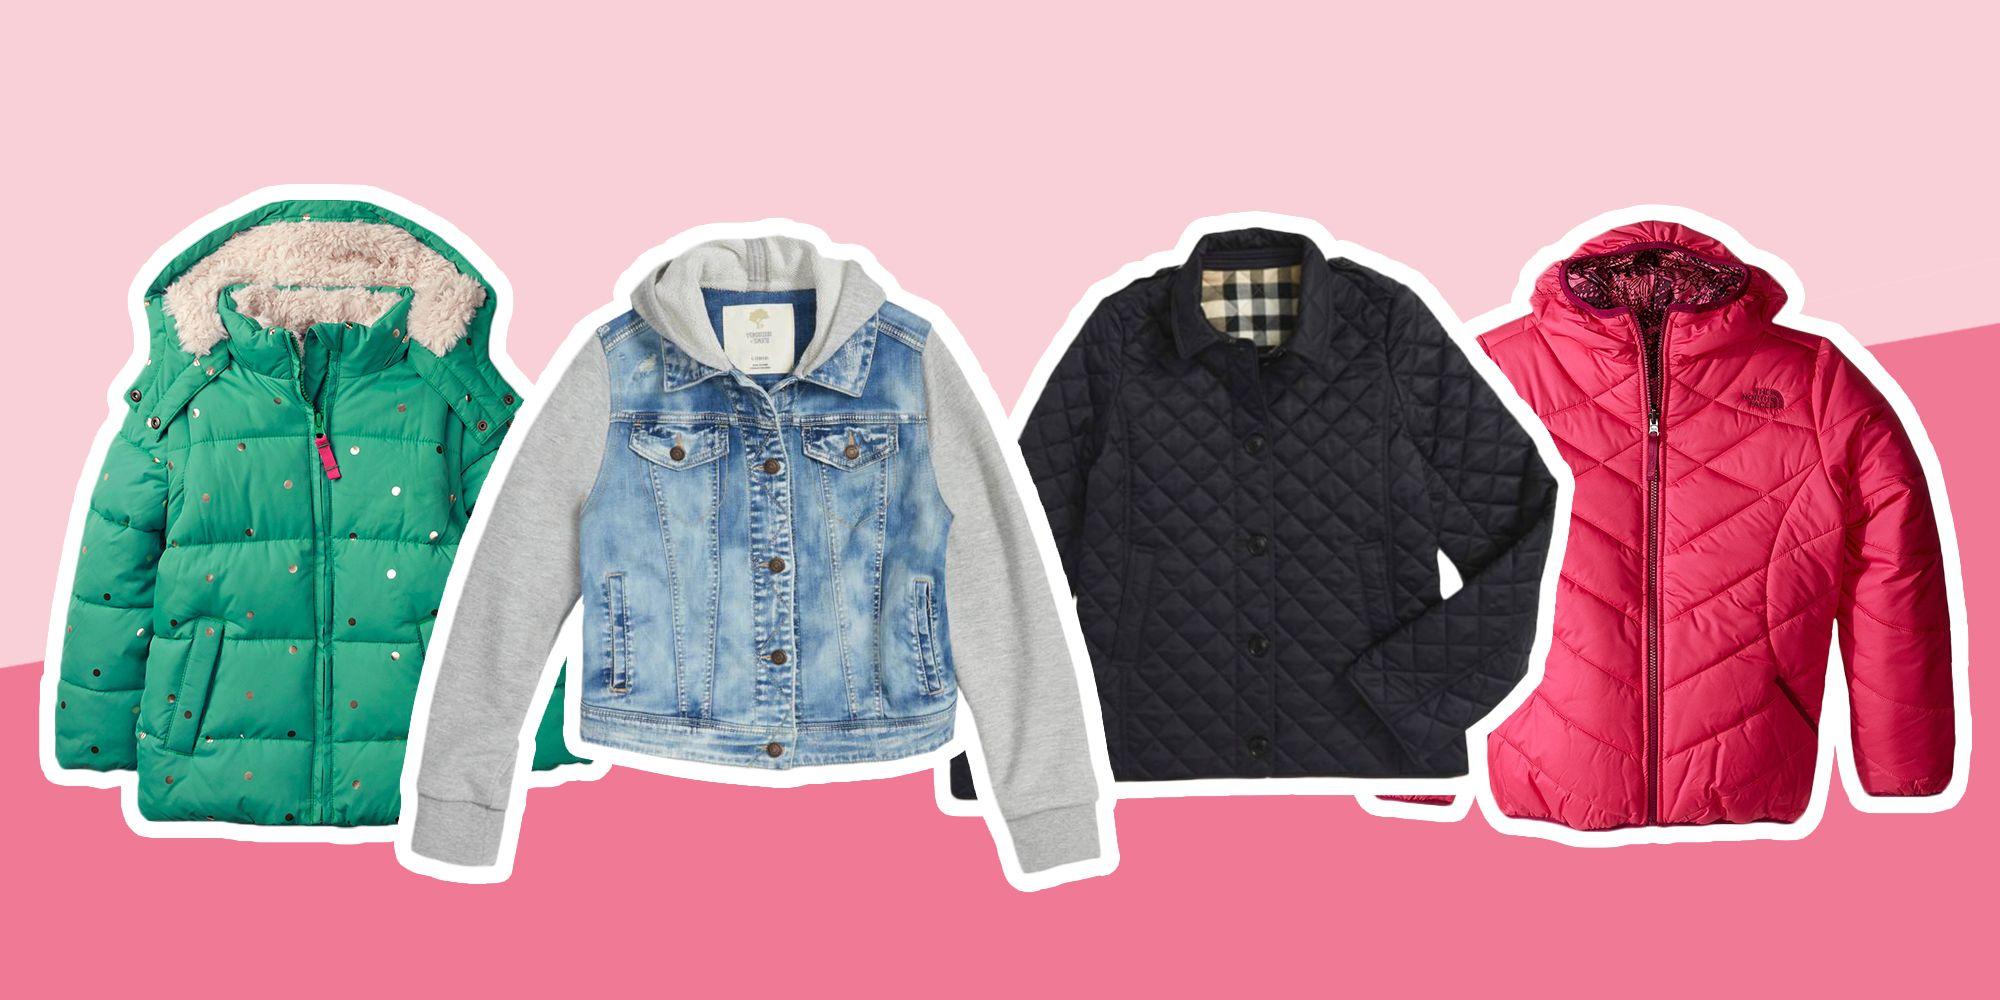 35e4ac4a5 8 Best Girls Jackets for Fall 2018 - Cute Coats for Girls